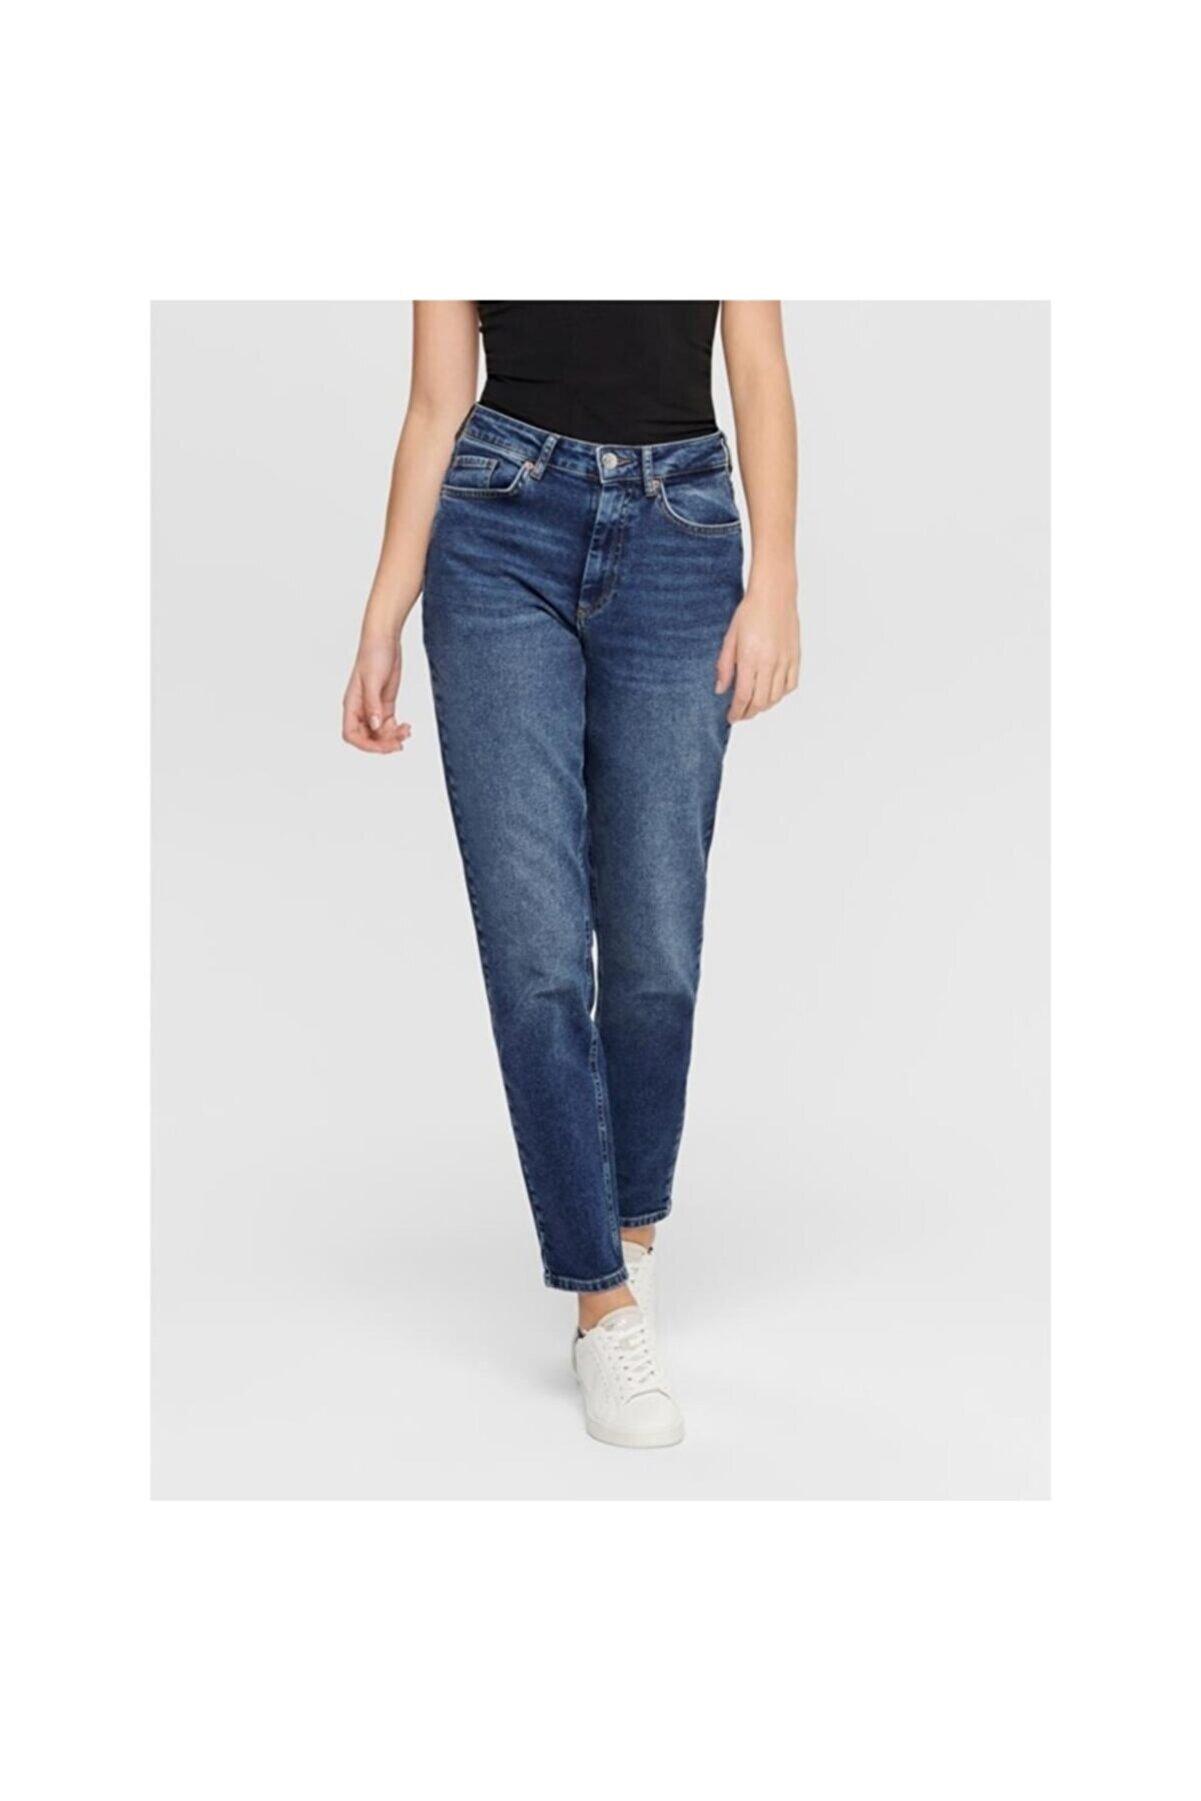 Only Veneda Life Mom Jeans Rea844 Noos Kadın Lacivert Jean 15206610-04